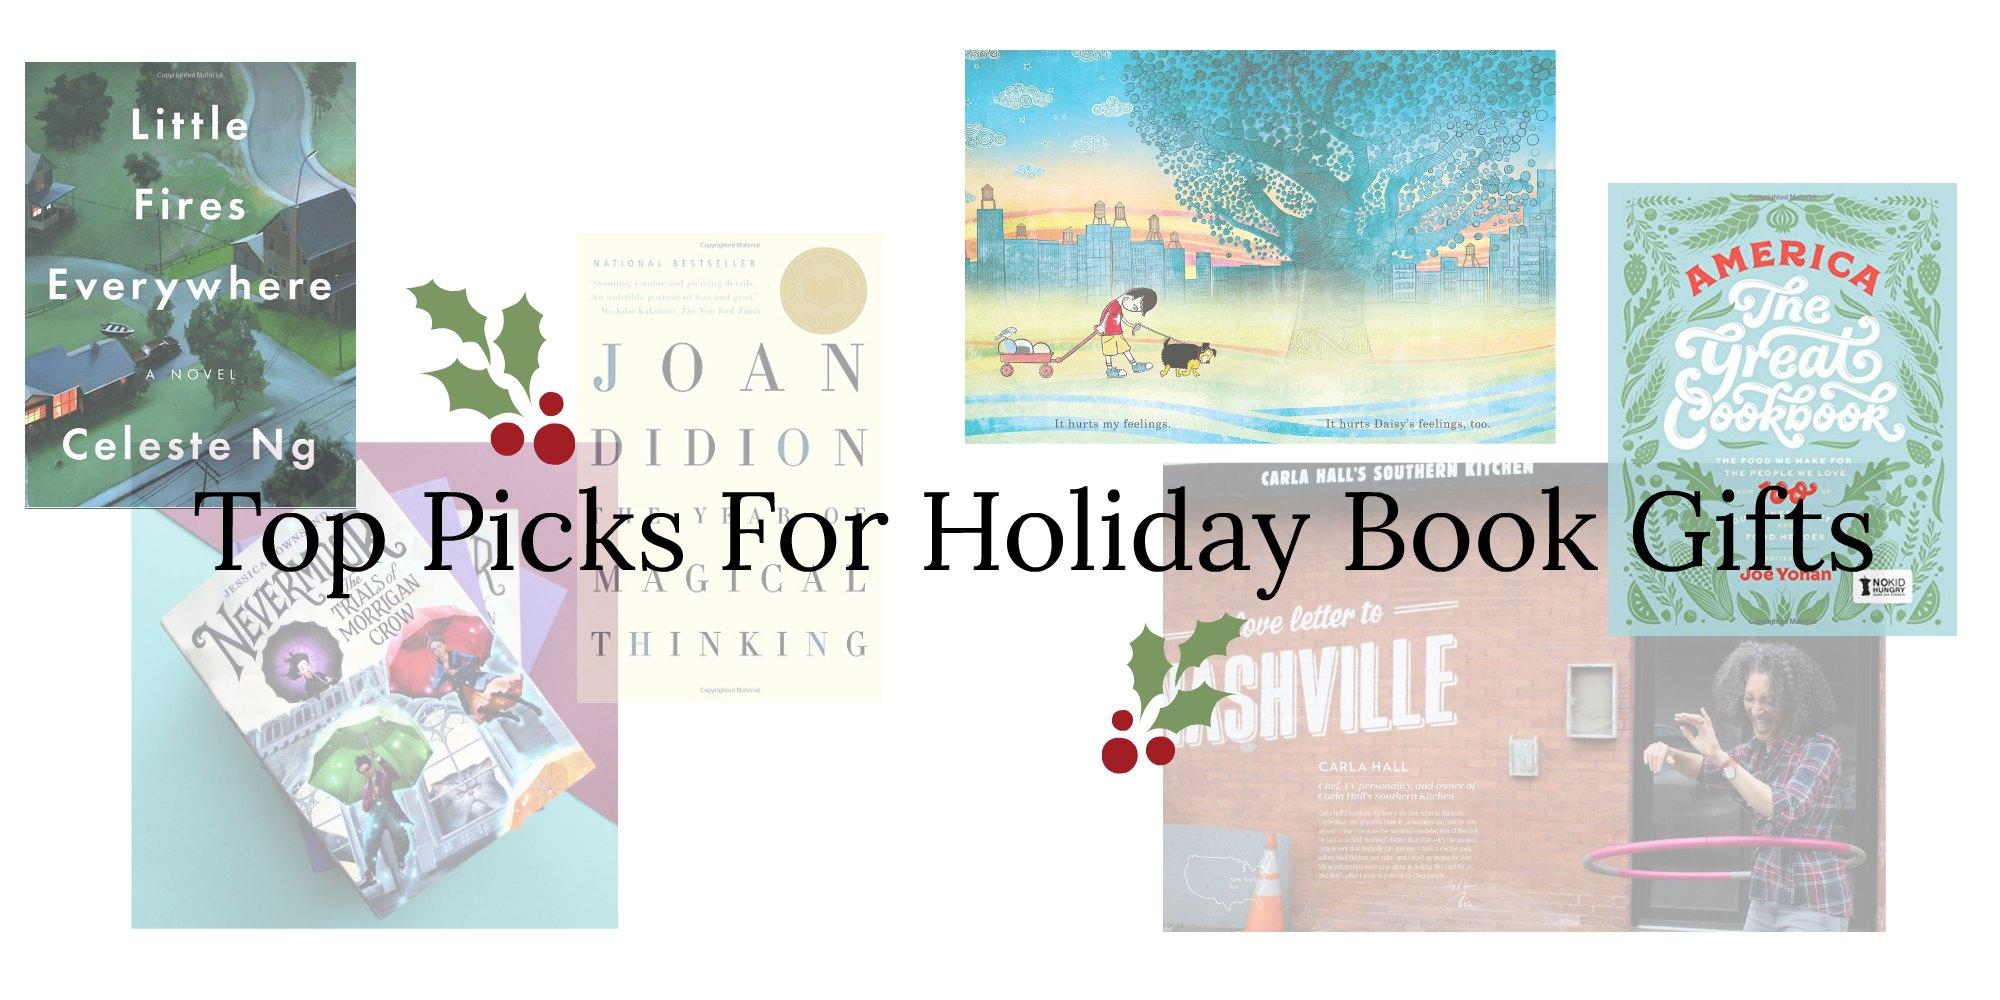 Gift books for the holidays - News - Nebraska City News-Press ...